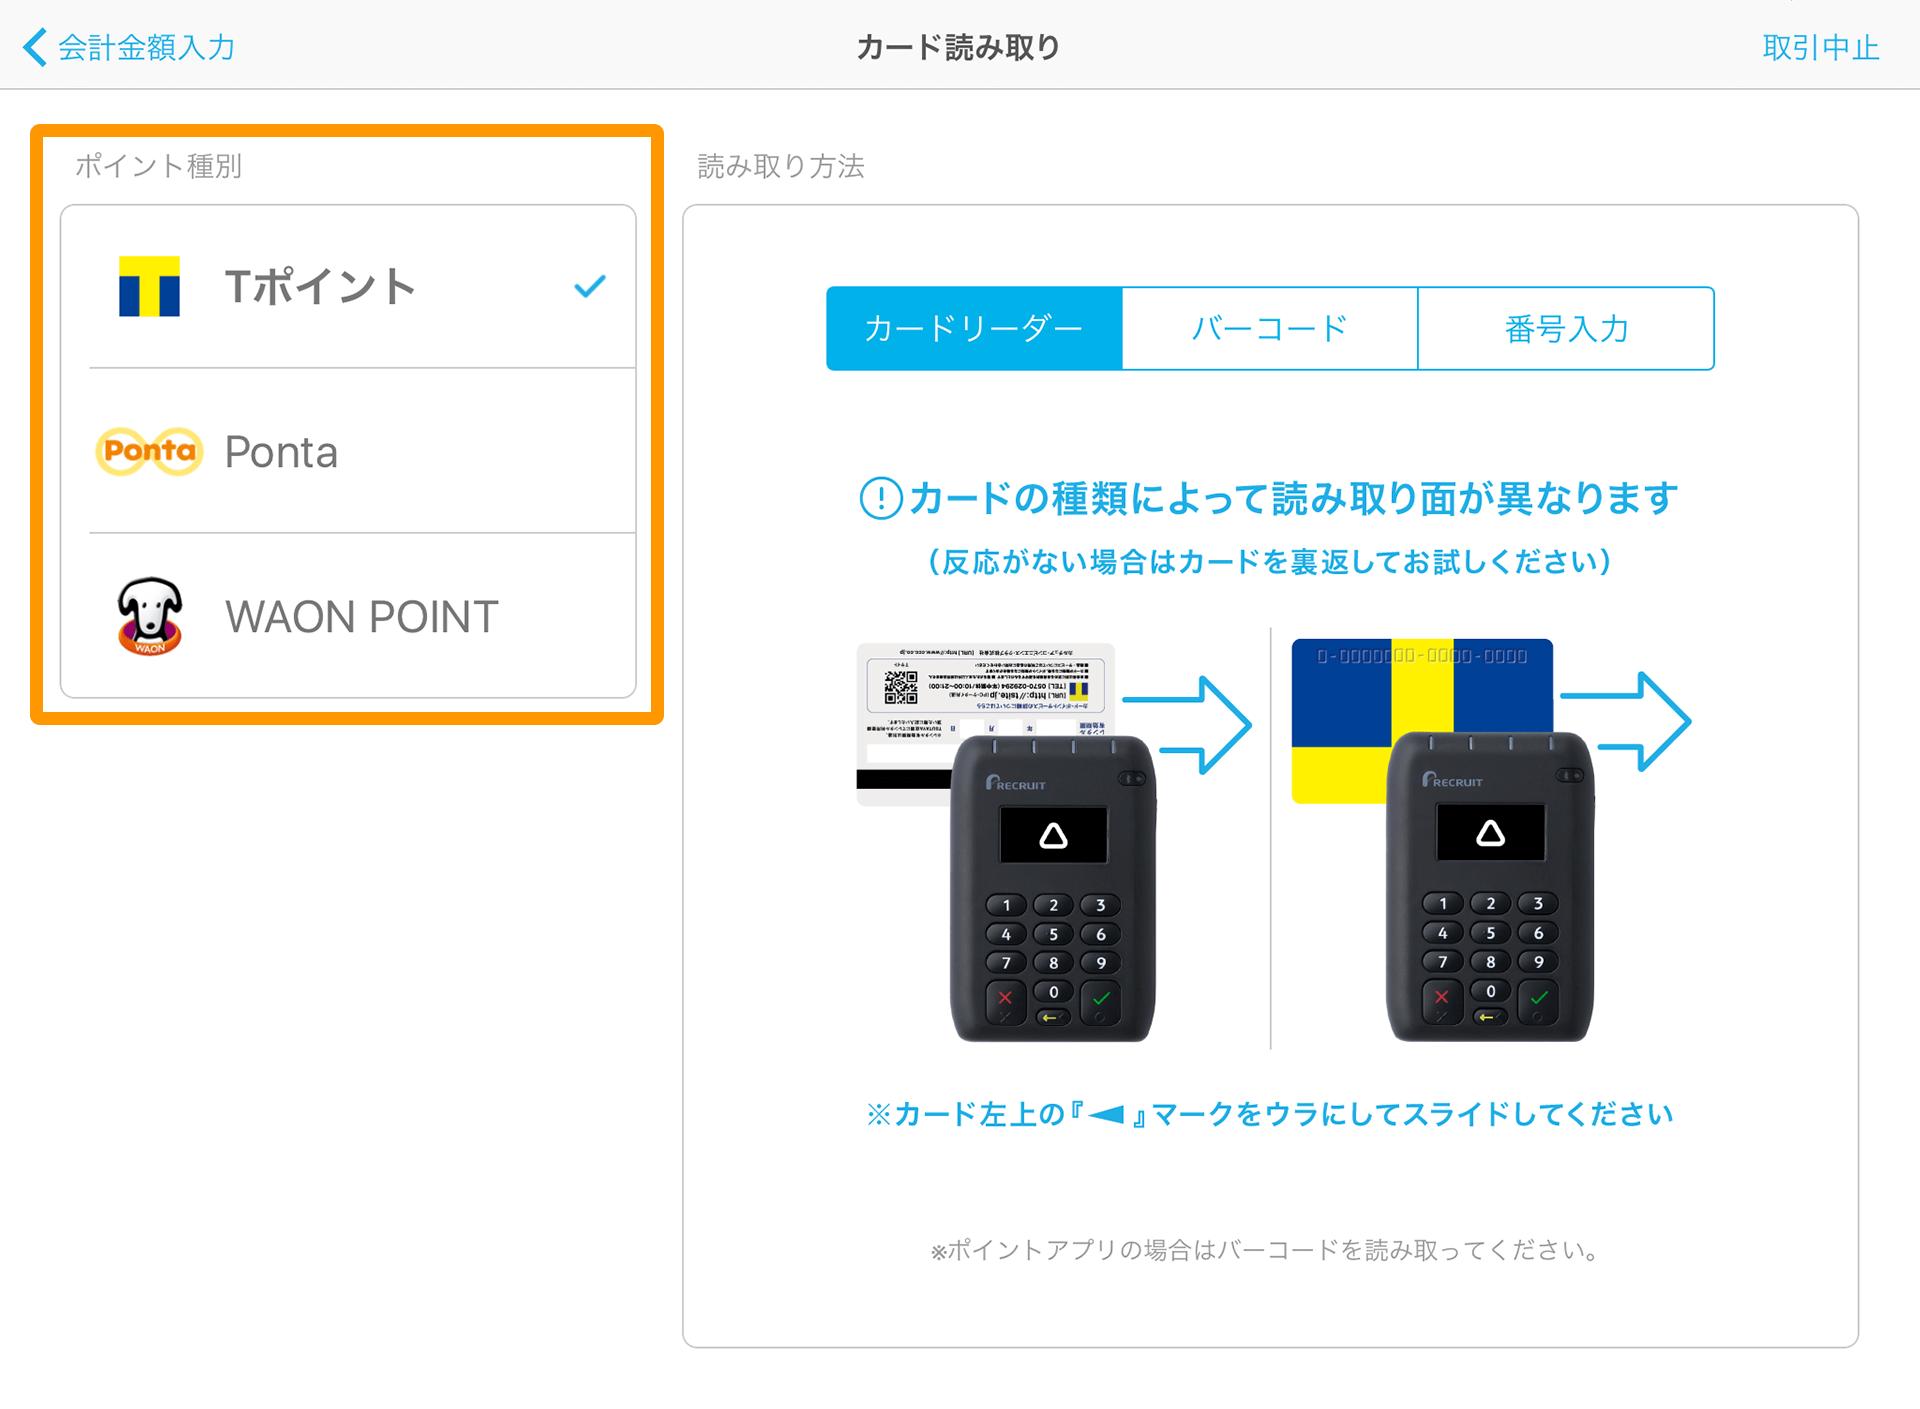 POICHI for Airレジ ポイント種別画面